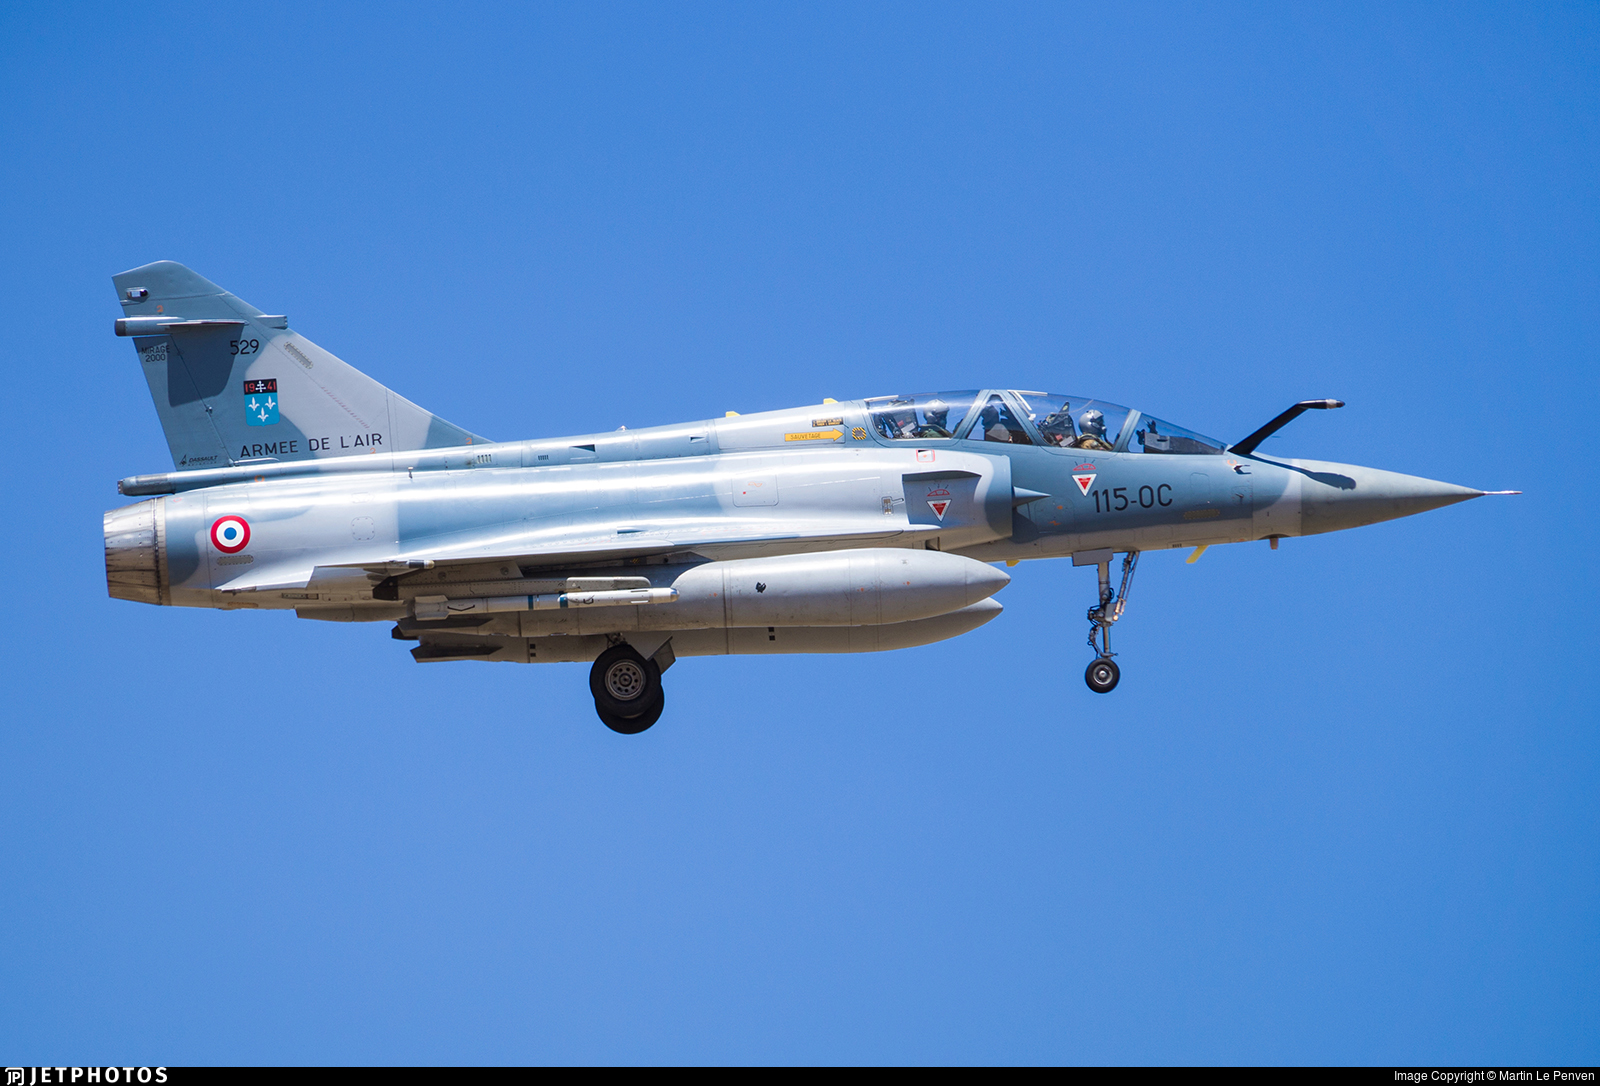 529 - Dassault Mirage 2000B - France - Air Force